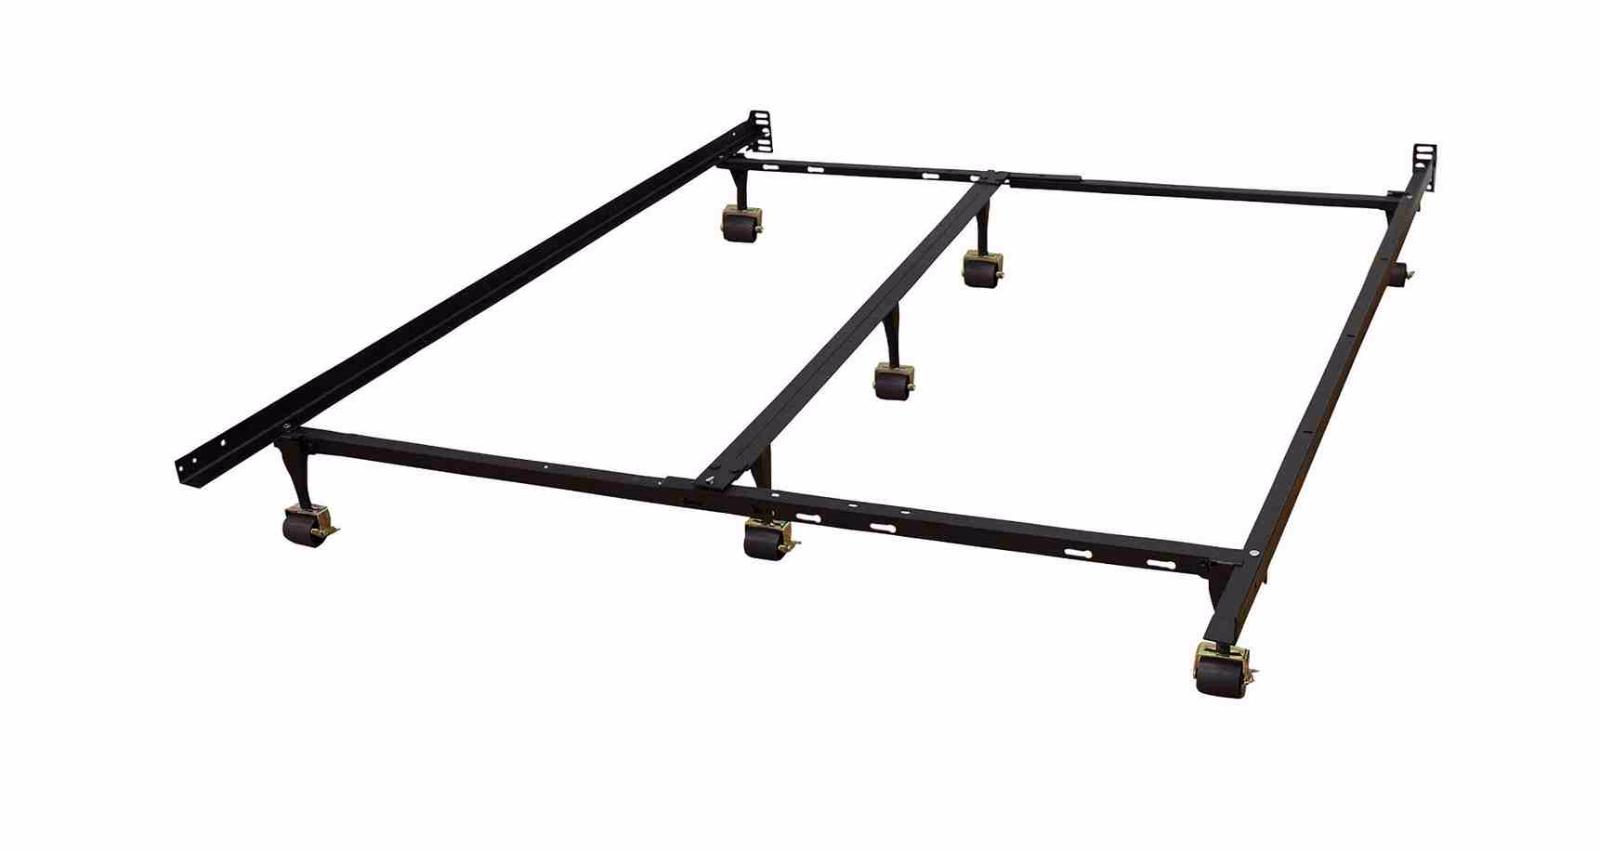 Modern Sleep Universal Heavy-Duty Adjustable Metal Bed Frame